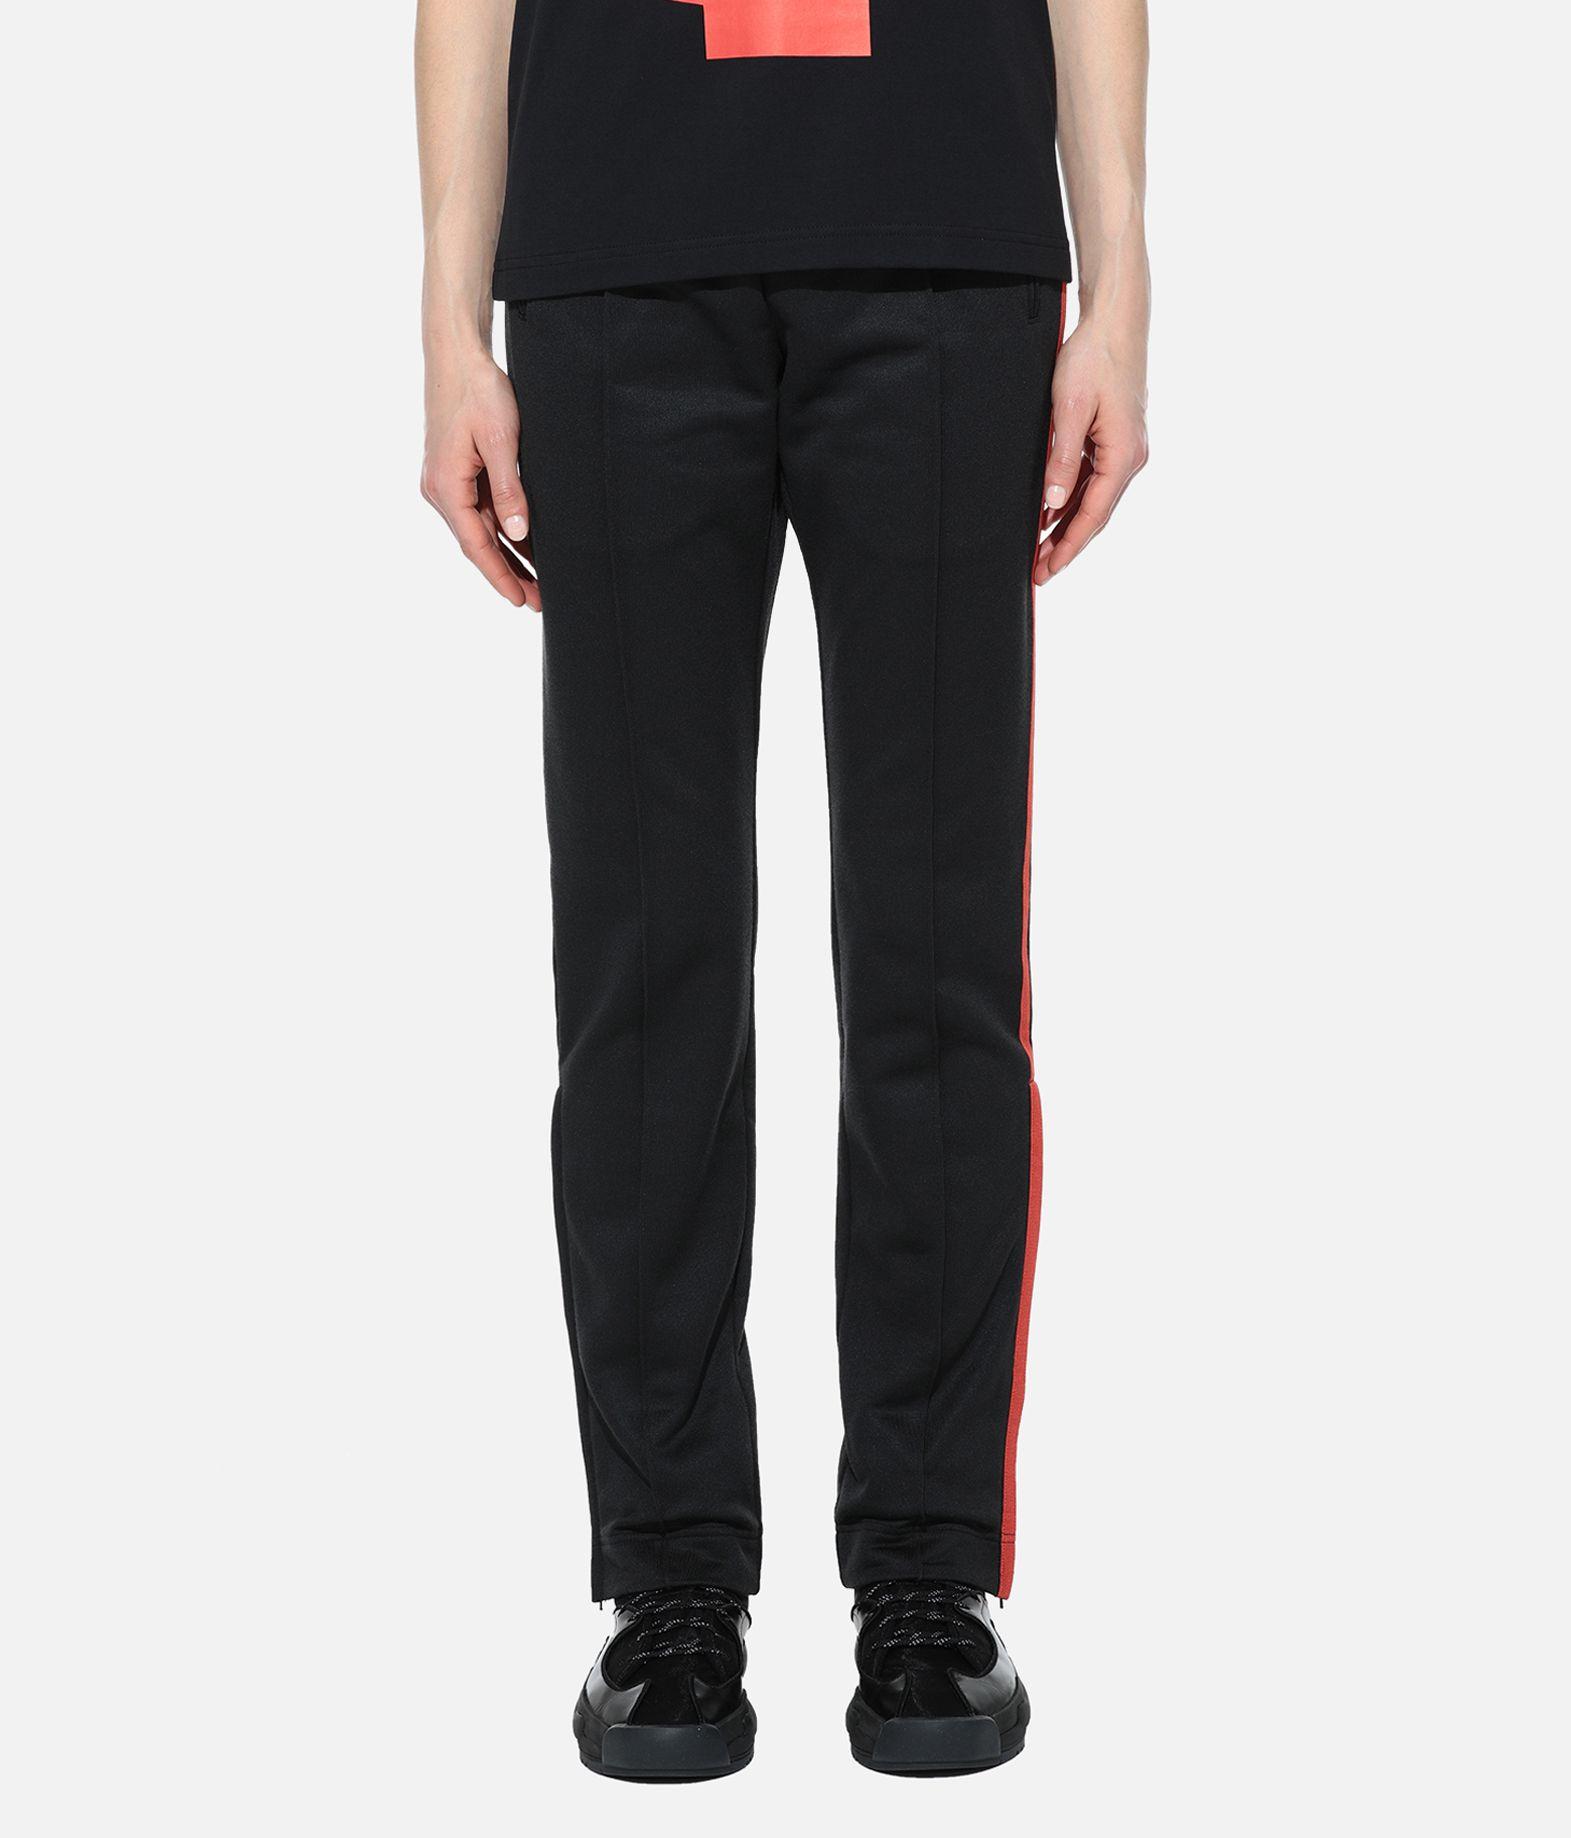 Y-3 Y-3 3-Stripes Slim Track Pants Track pant Woman r